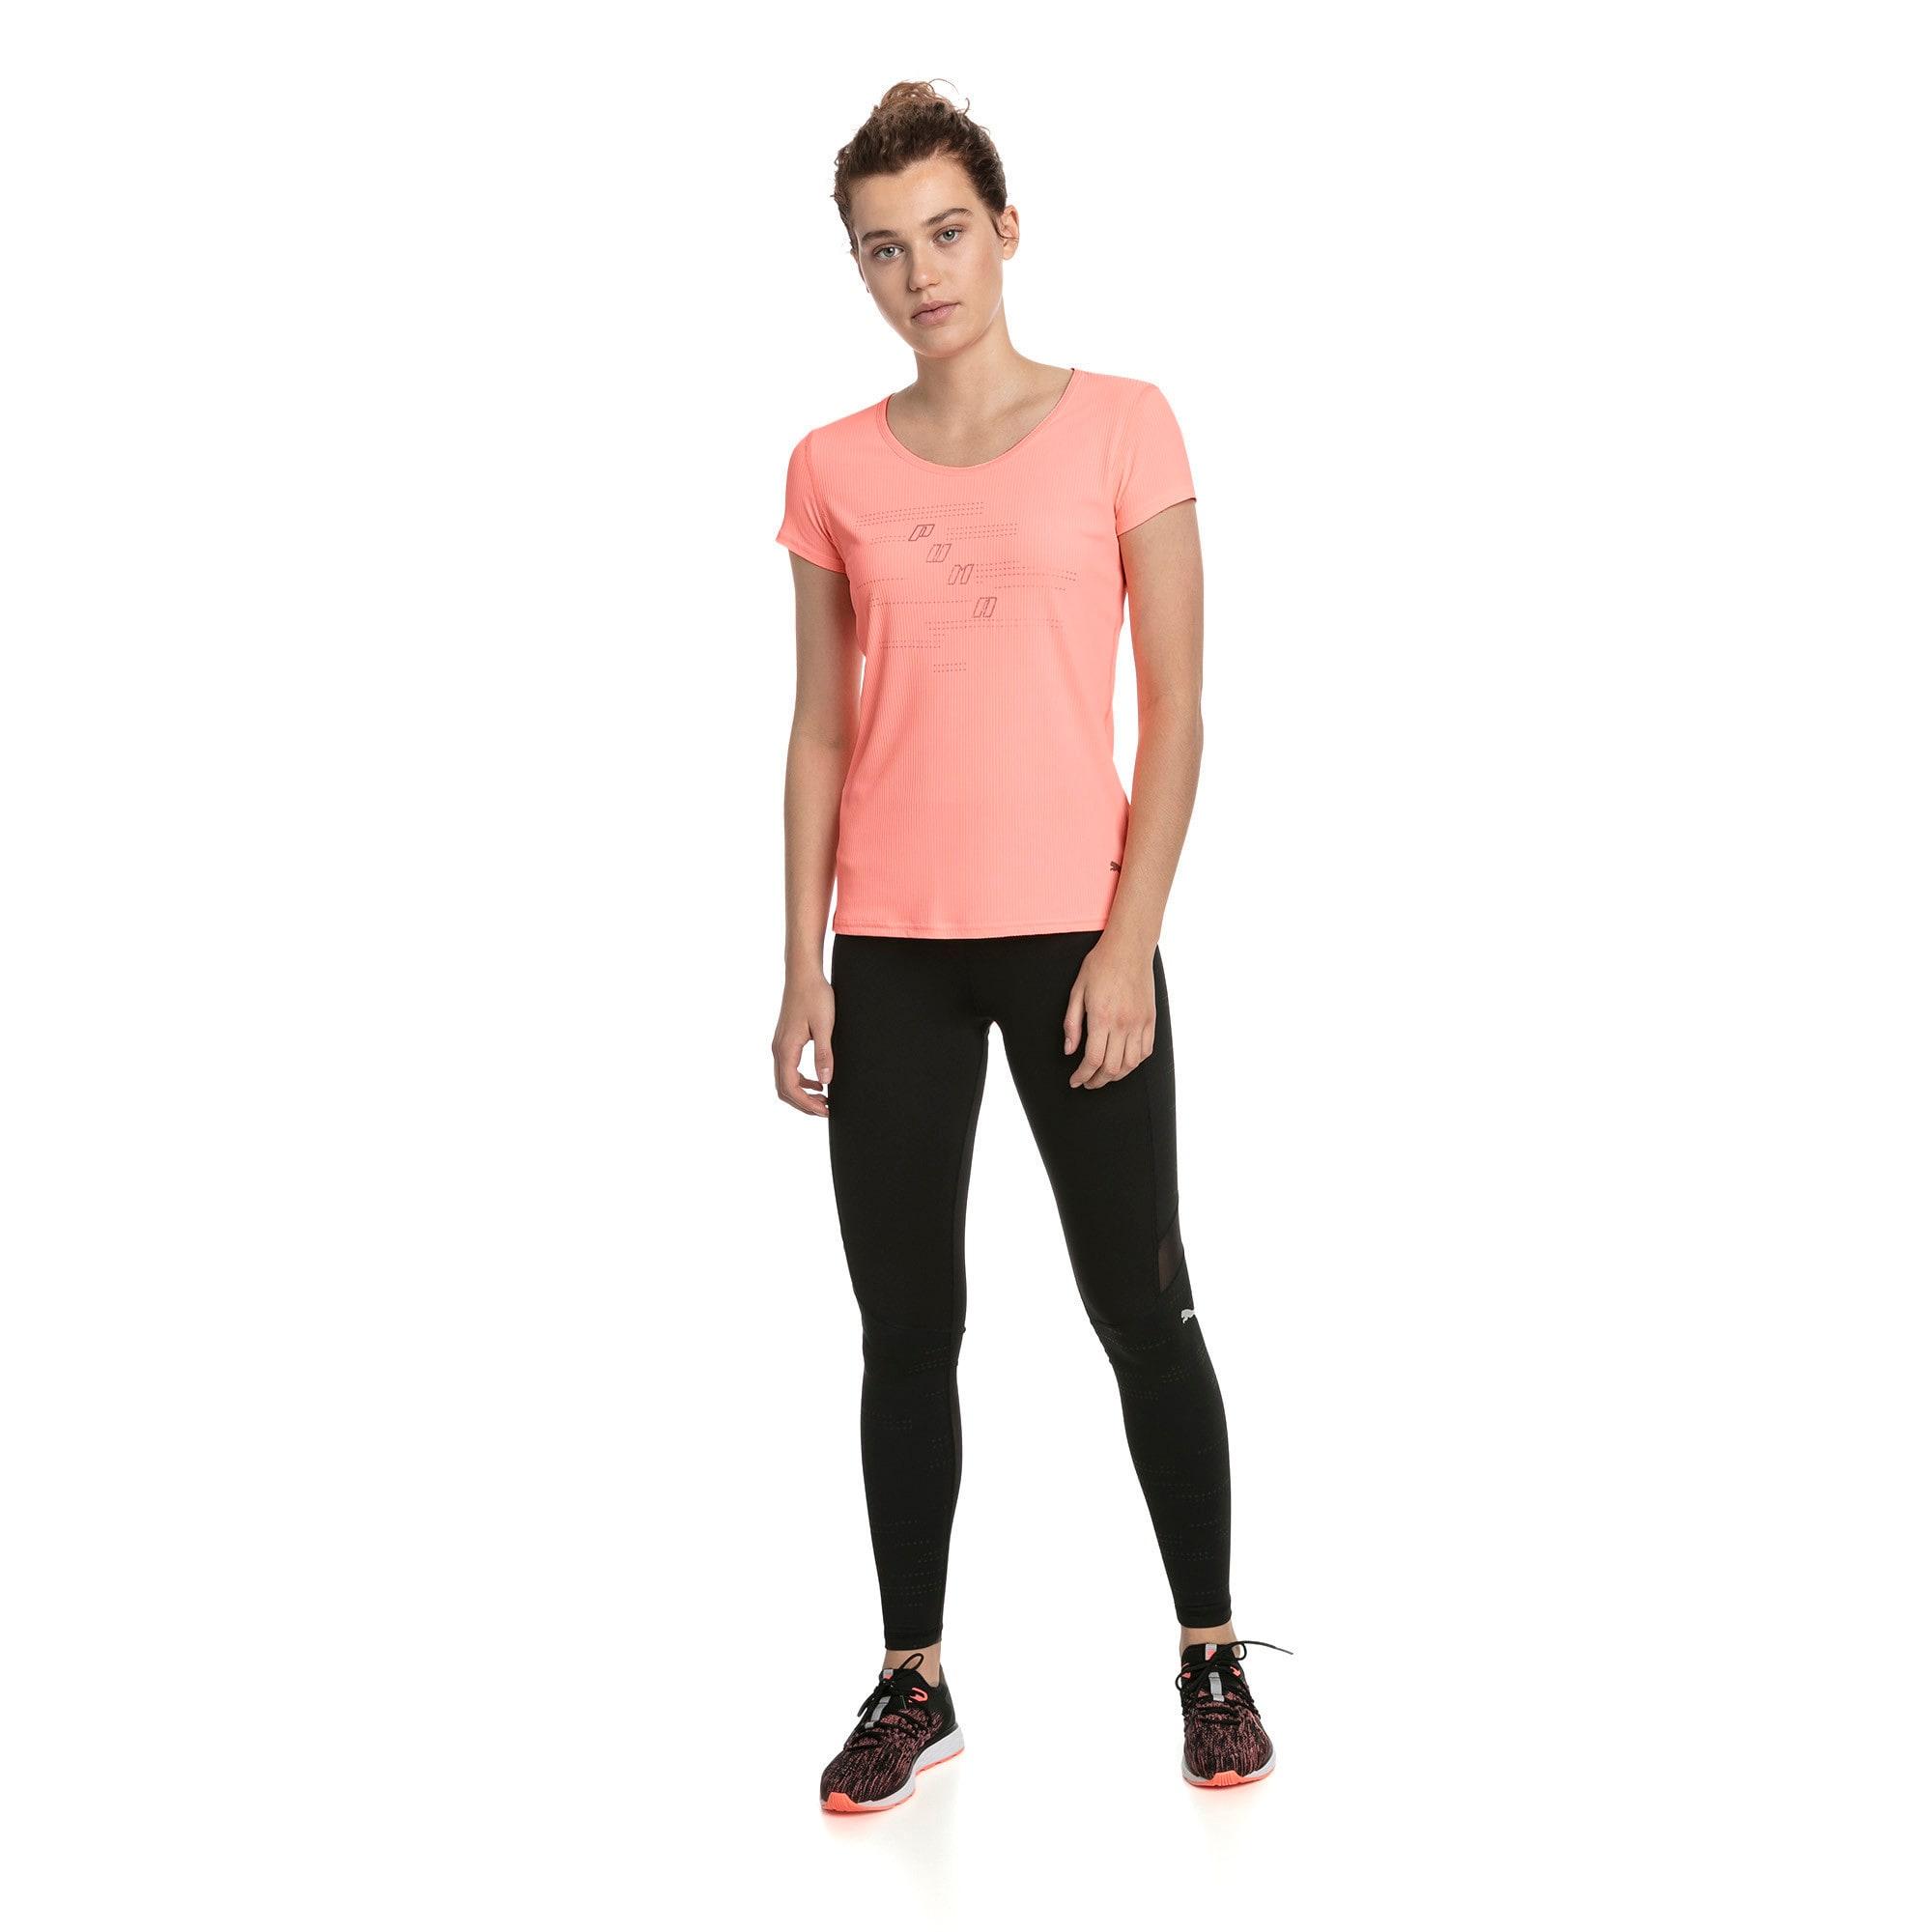 Thumbnail 3 of Ignite Women's Running Leggings, Puma Black, medium-IND